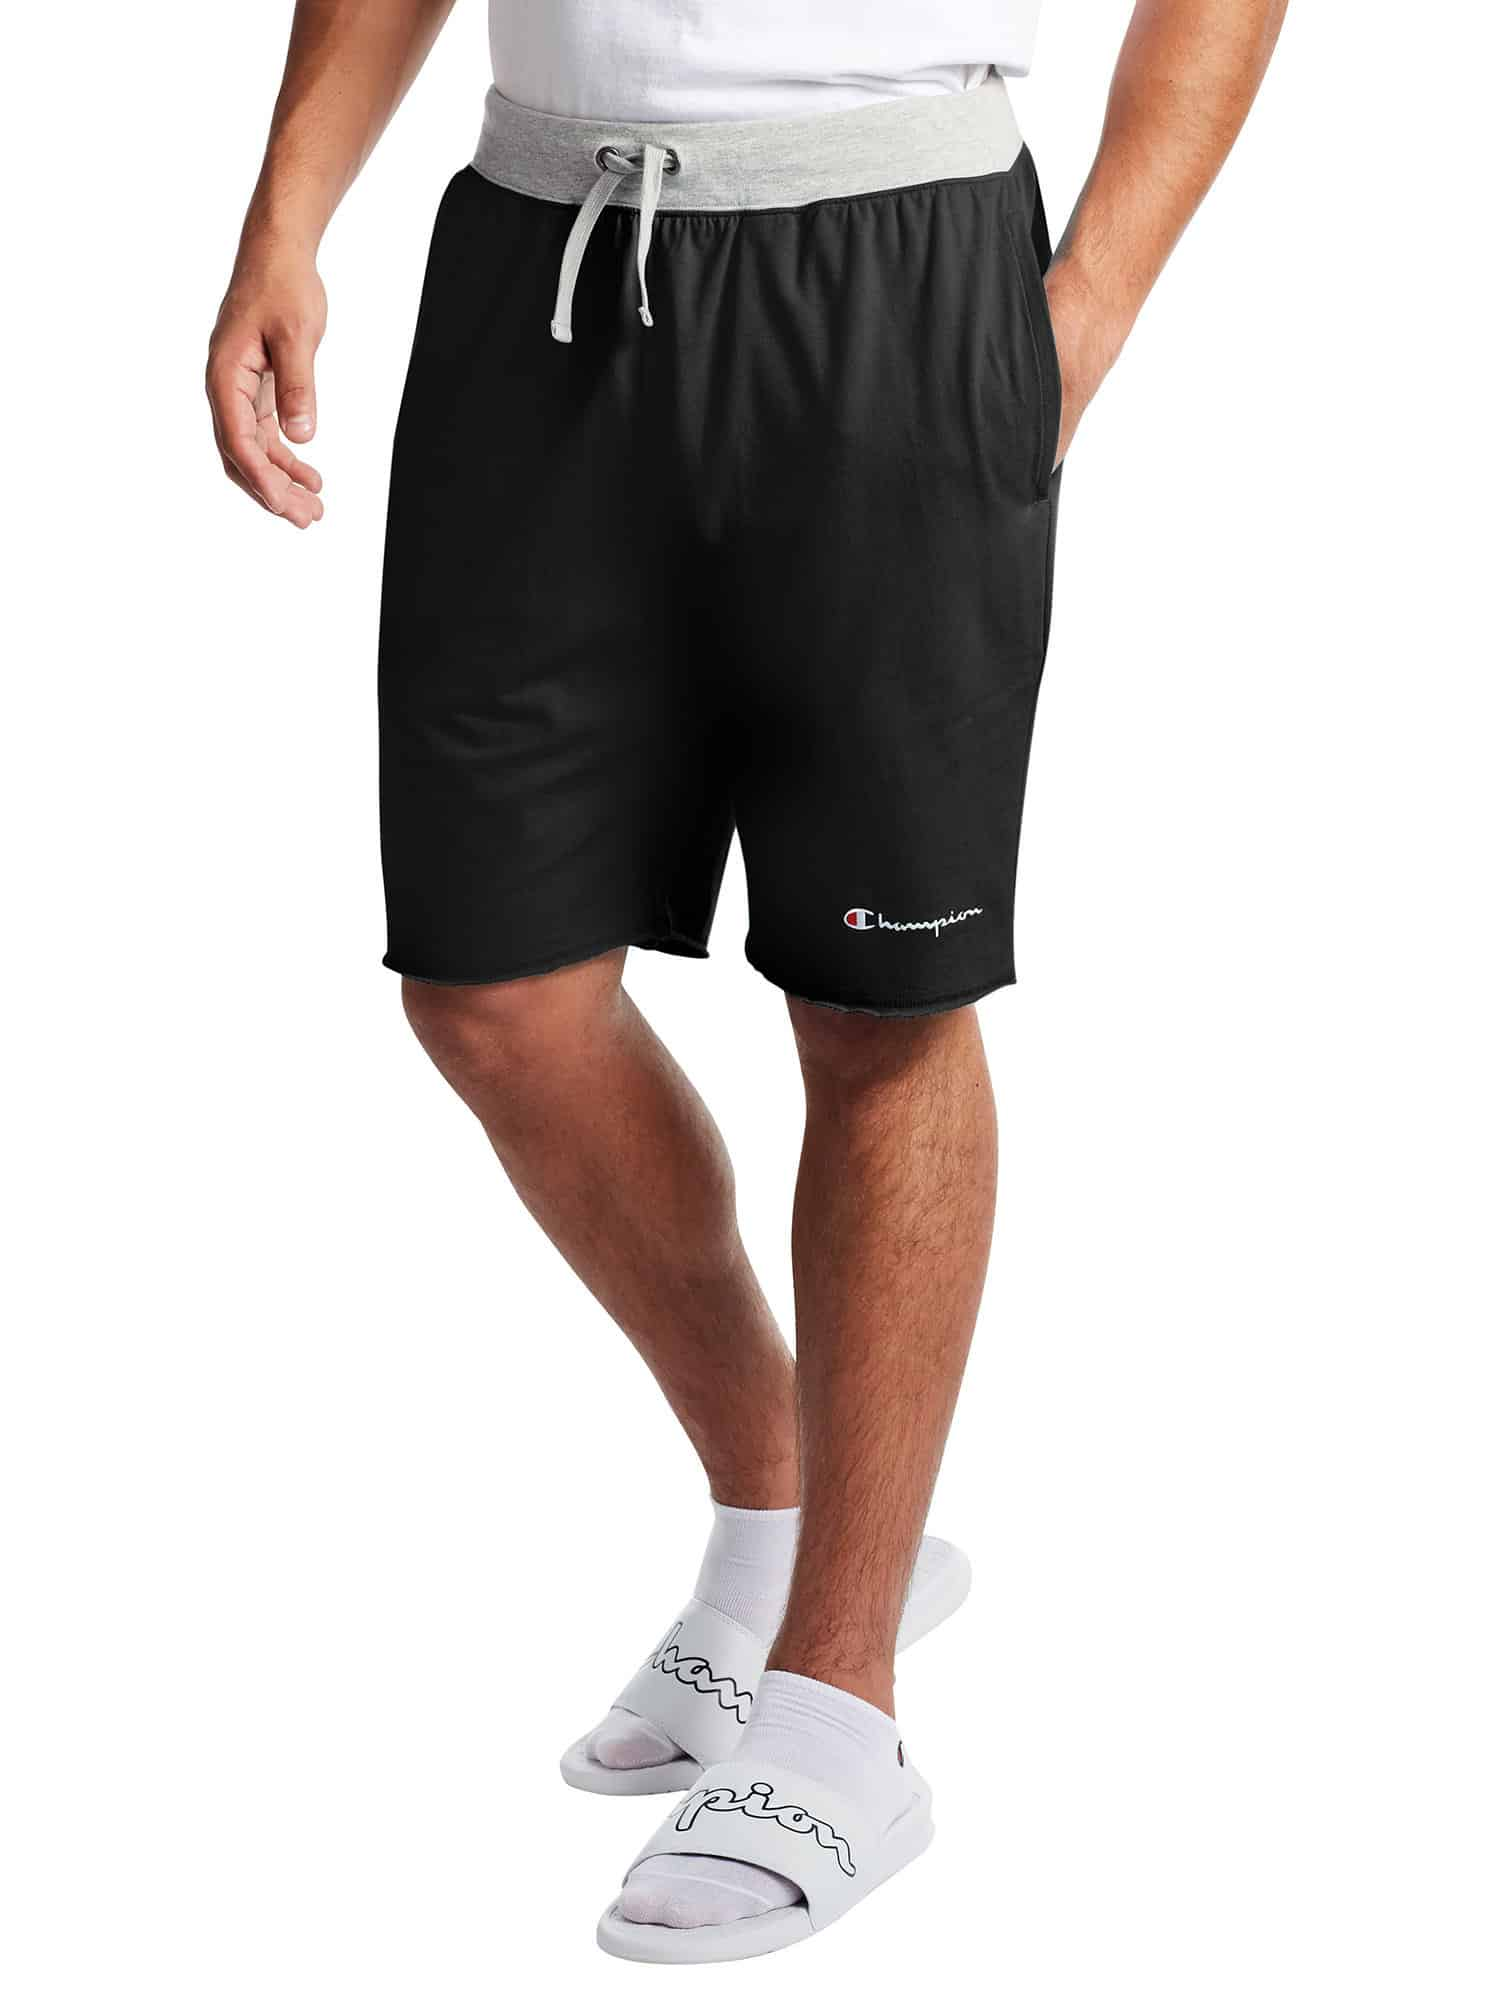 black men's shorts, a good gift for teen boys